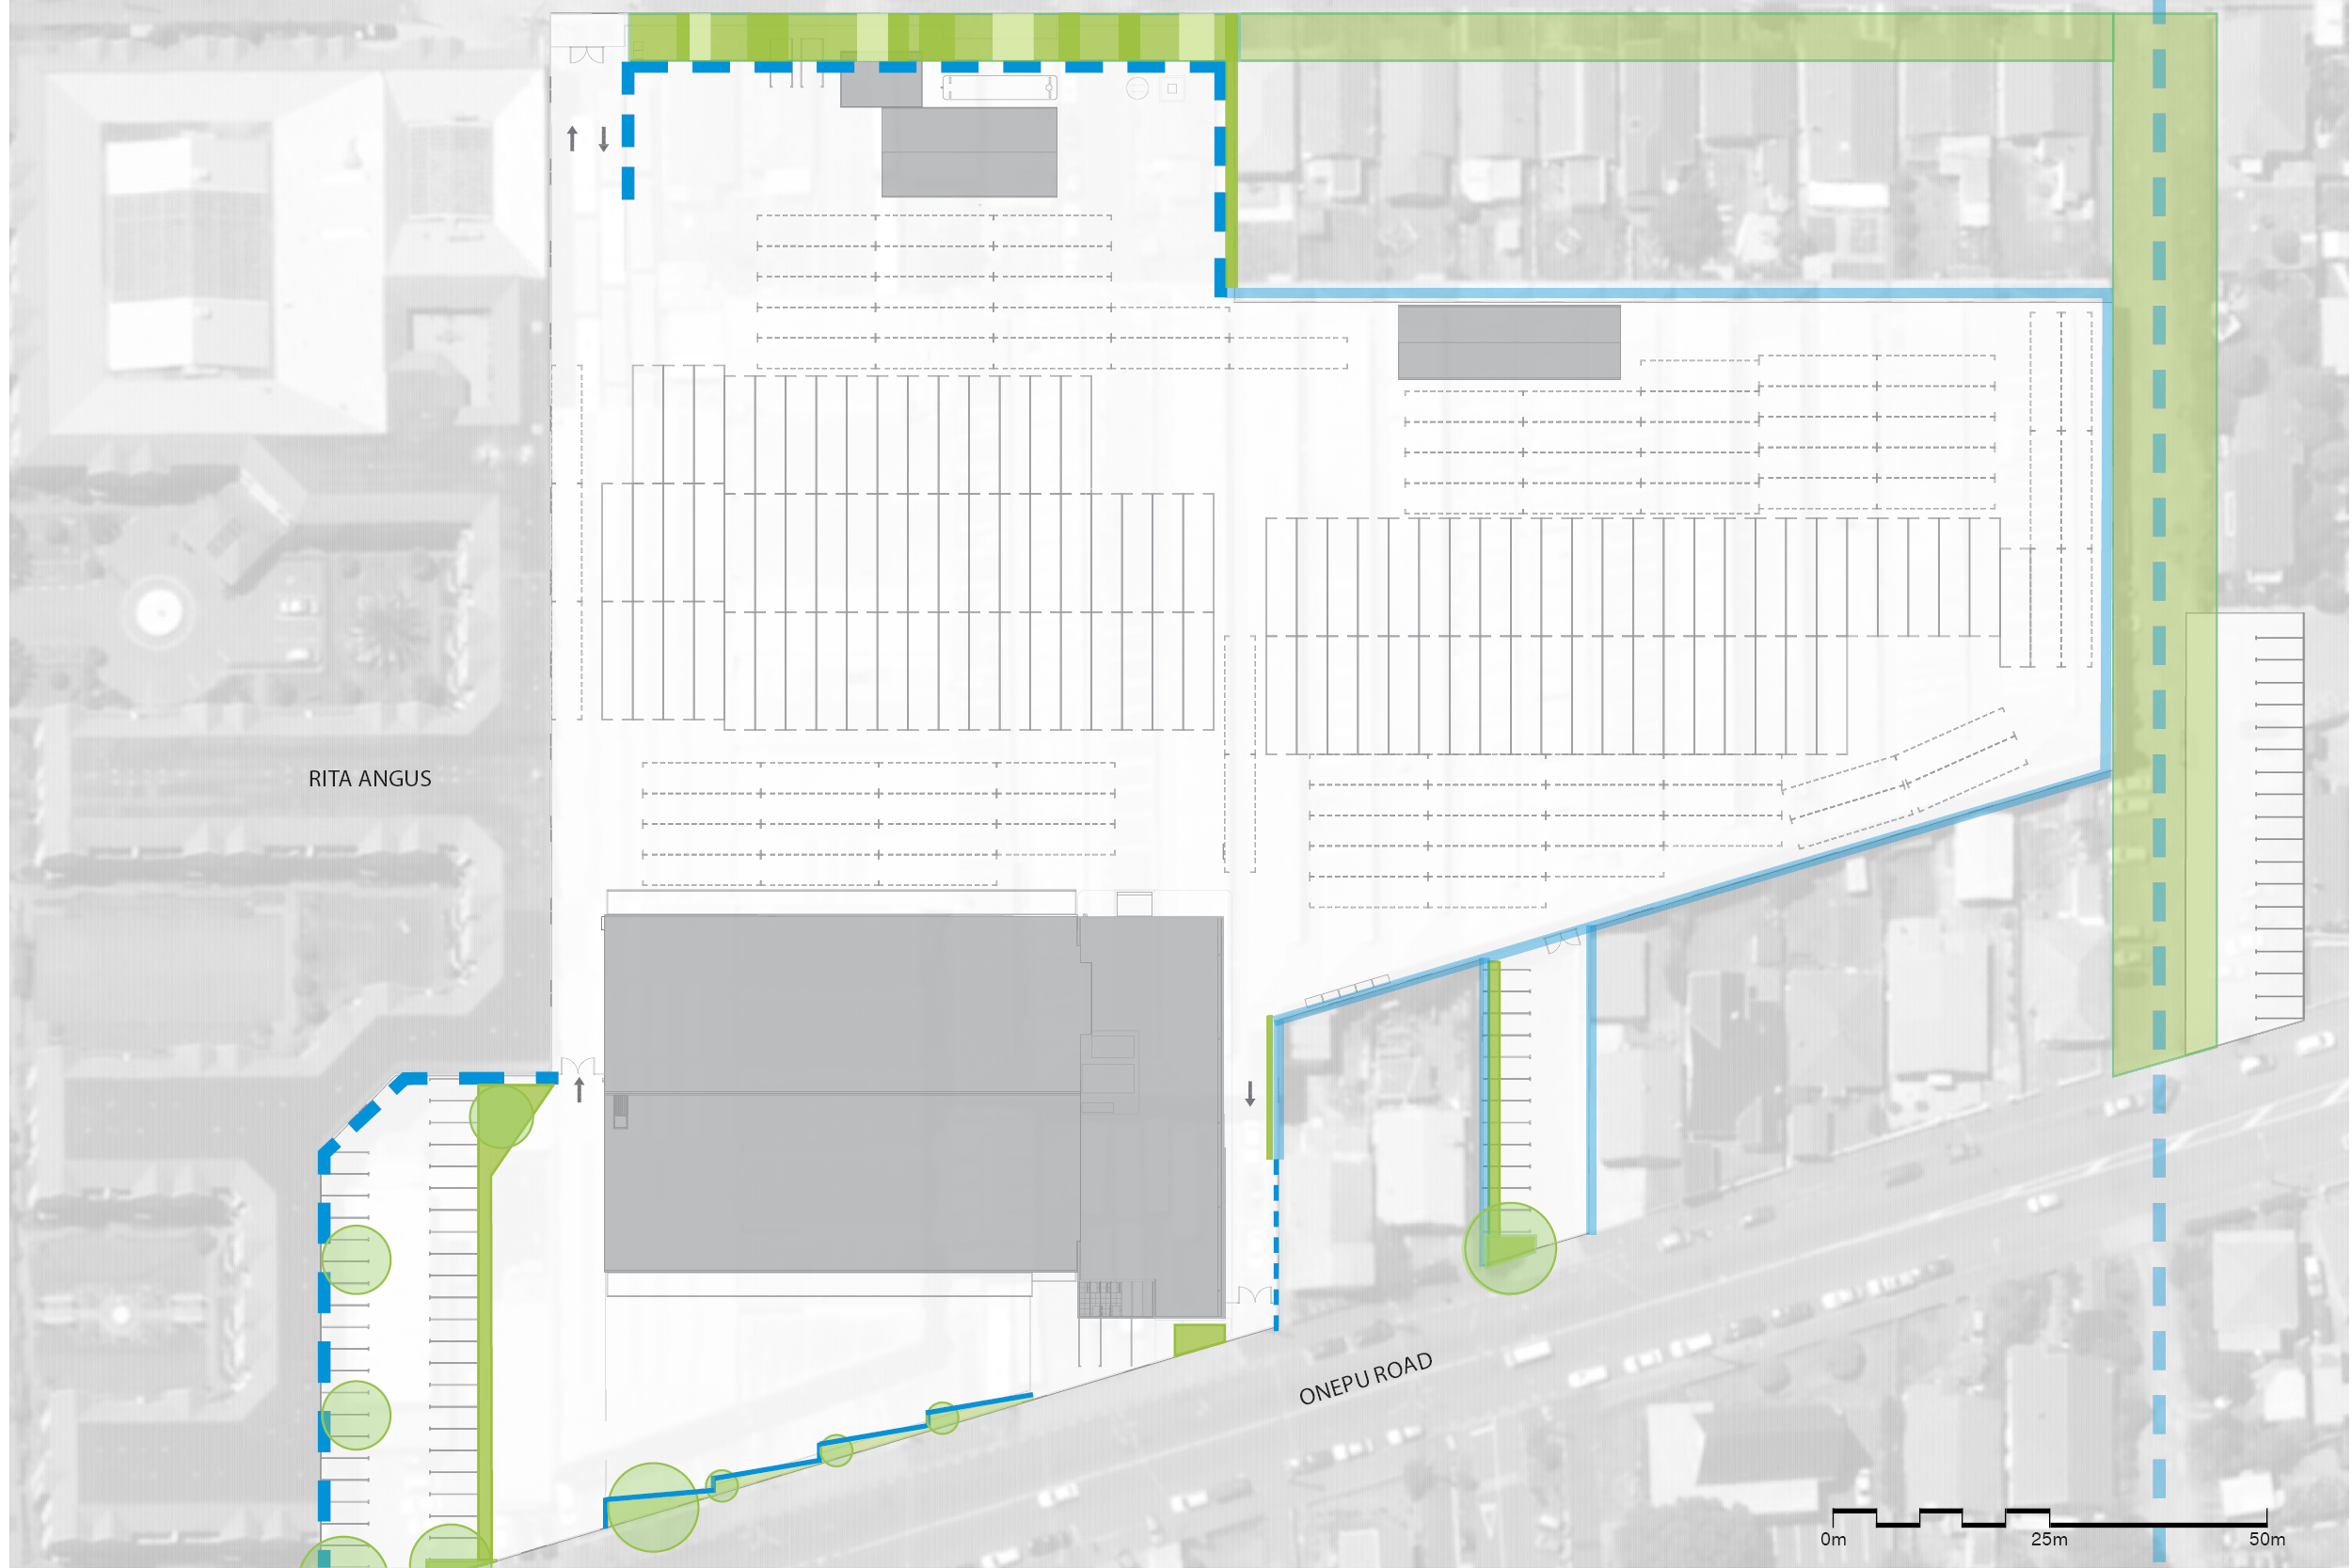 Large_scale_development_Landscape_plan.jpg